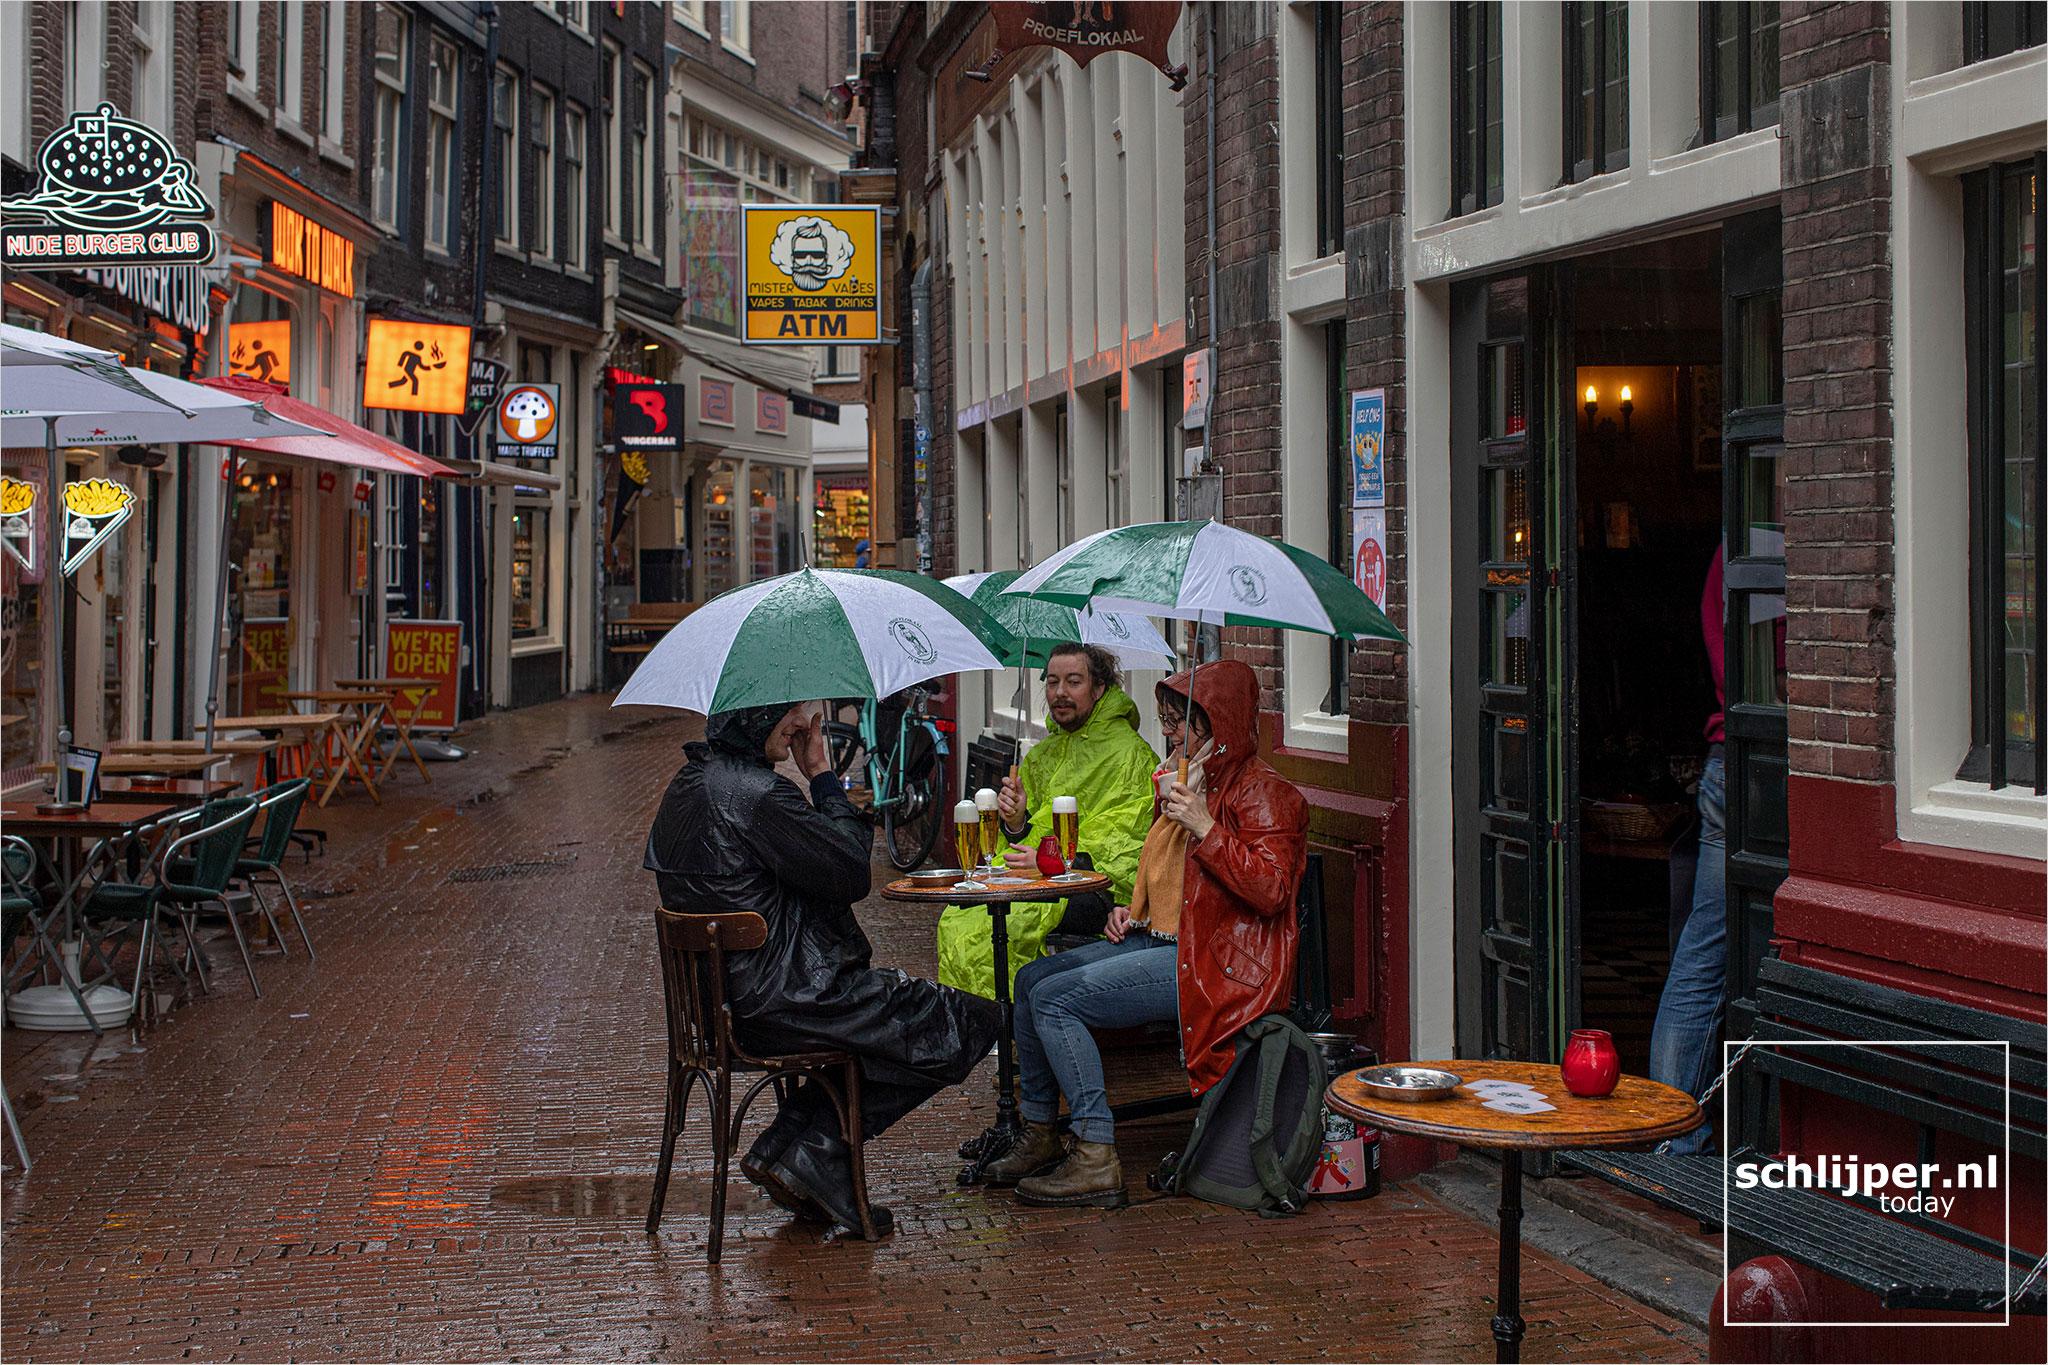 The Netherlands, Amsterdam, 29 april 2021